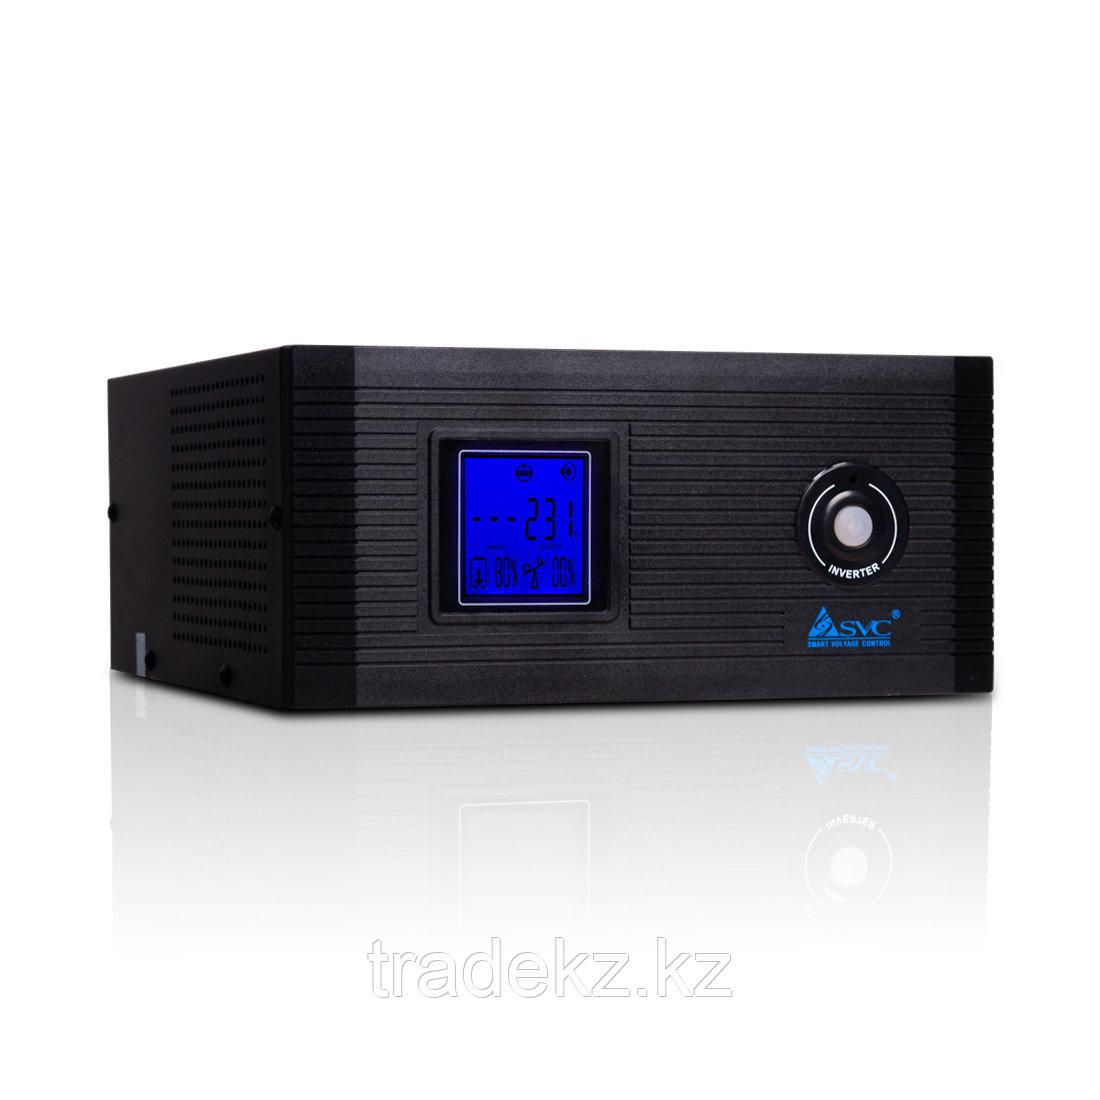 Инвертор, преобразователь напряжения SVC DI-1000-F-LCD(U)